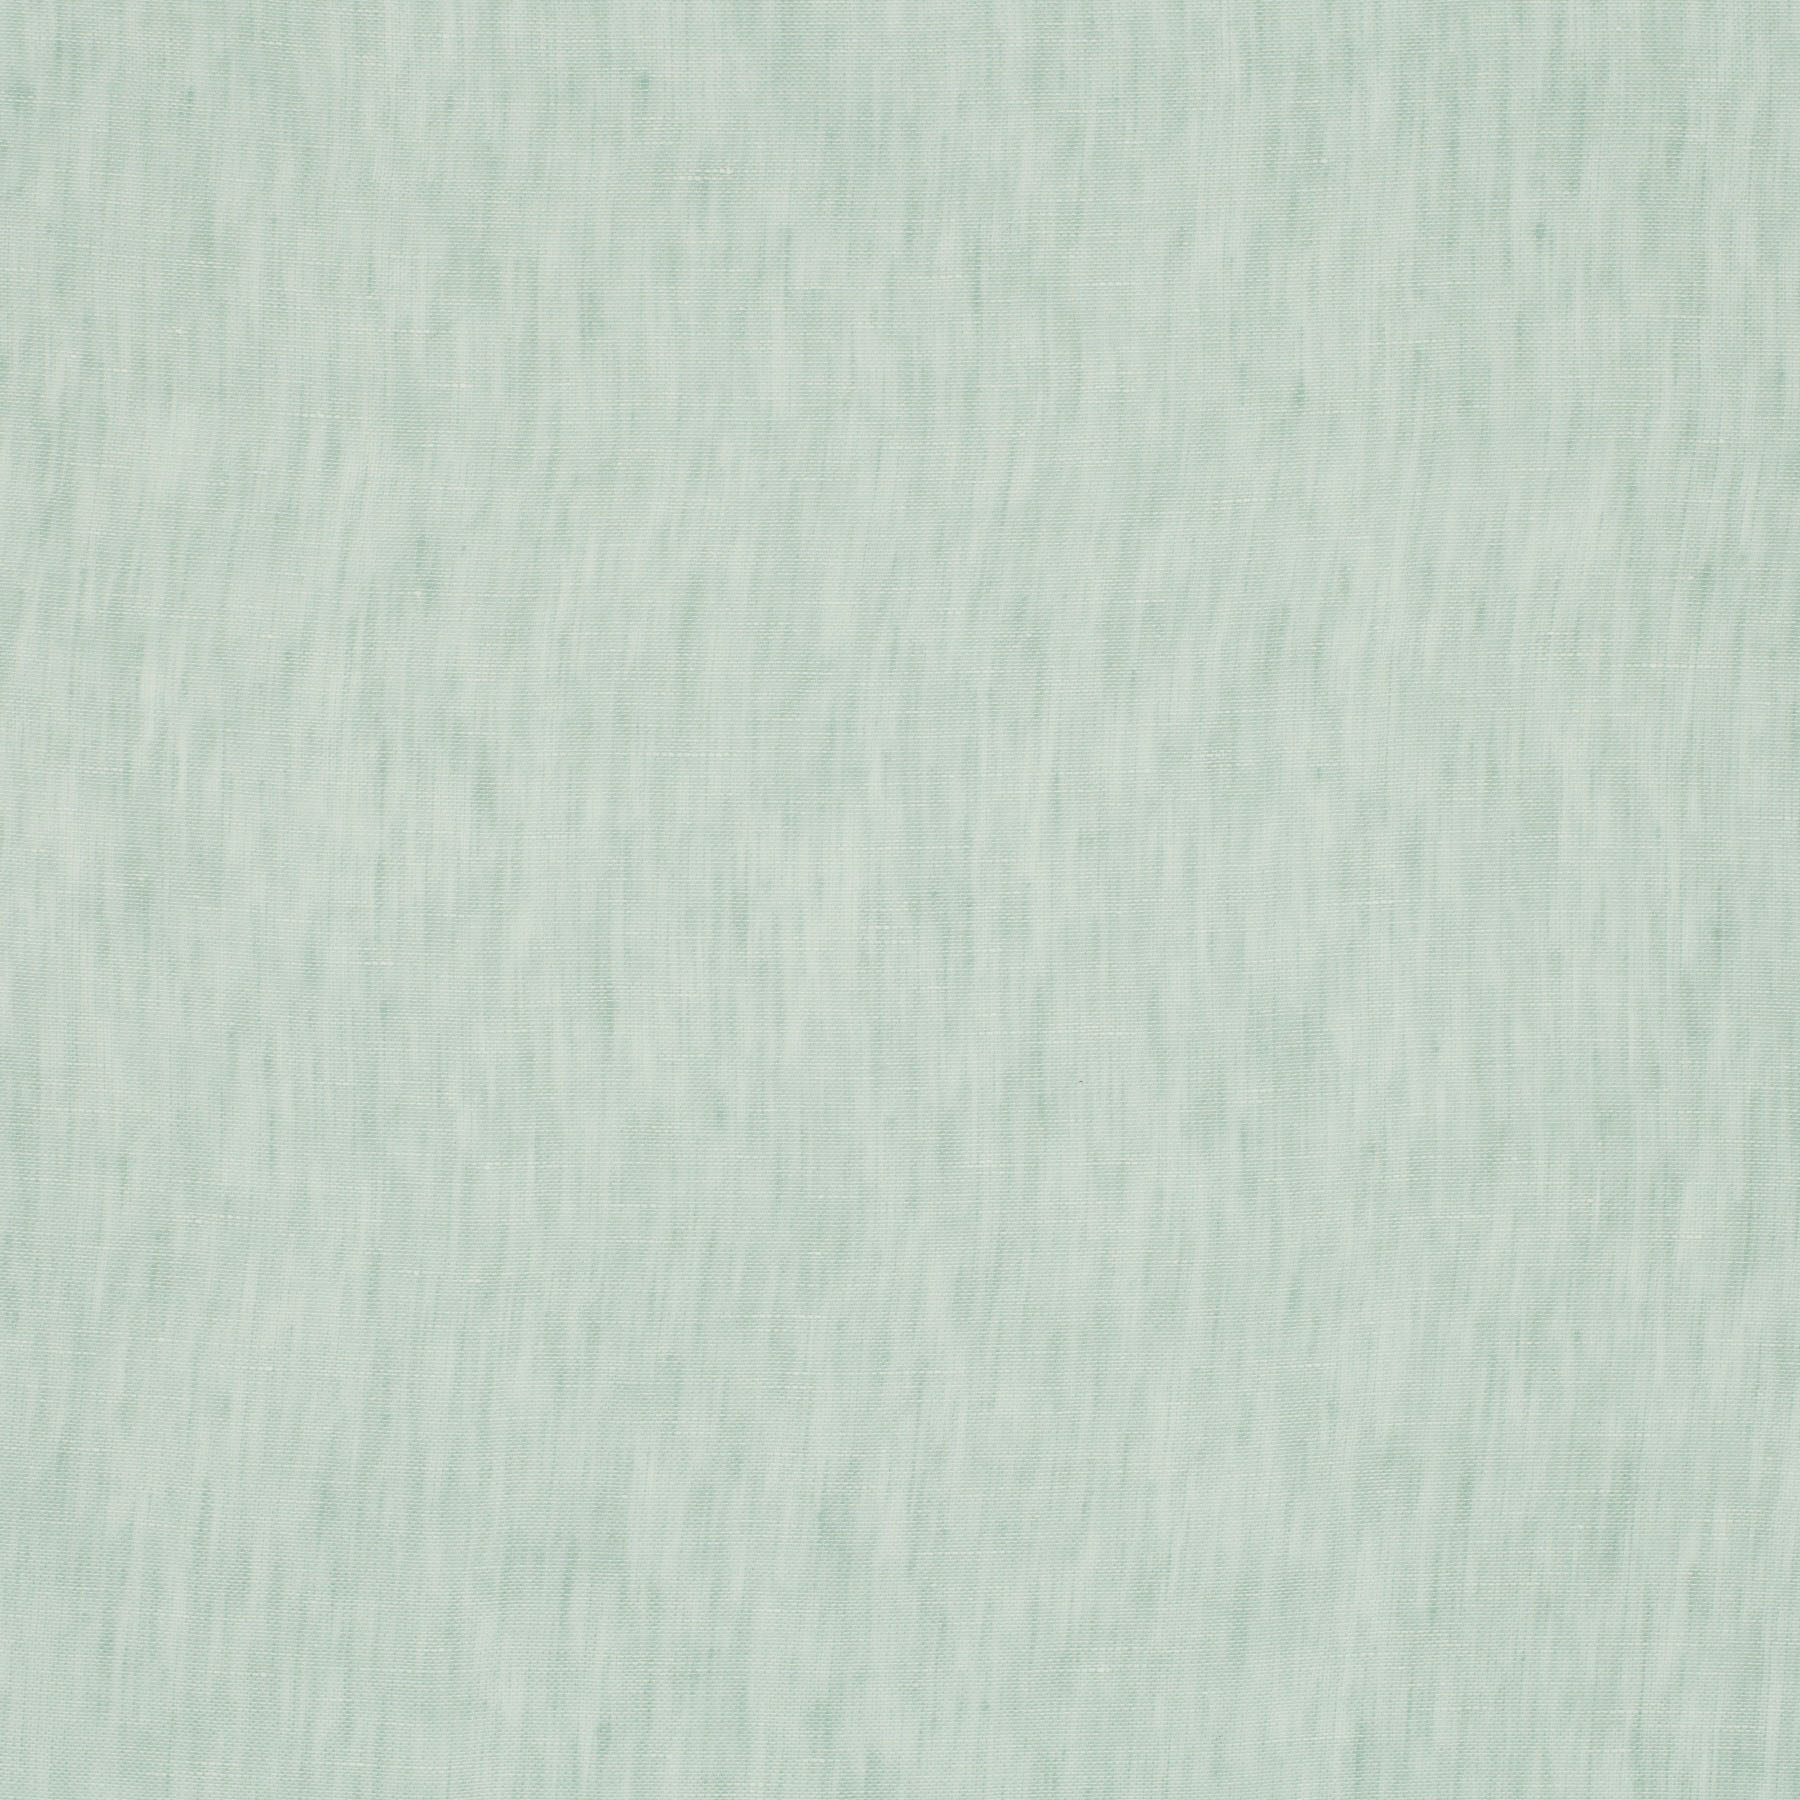 decoration fabric dorset 1 6766 080 jab anstoetz fabrics. Black Bedroom Furniture Sets. Home Design Ideas